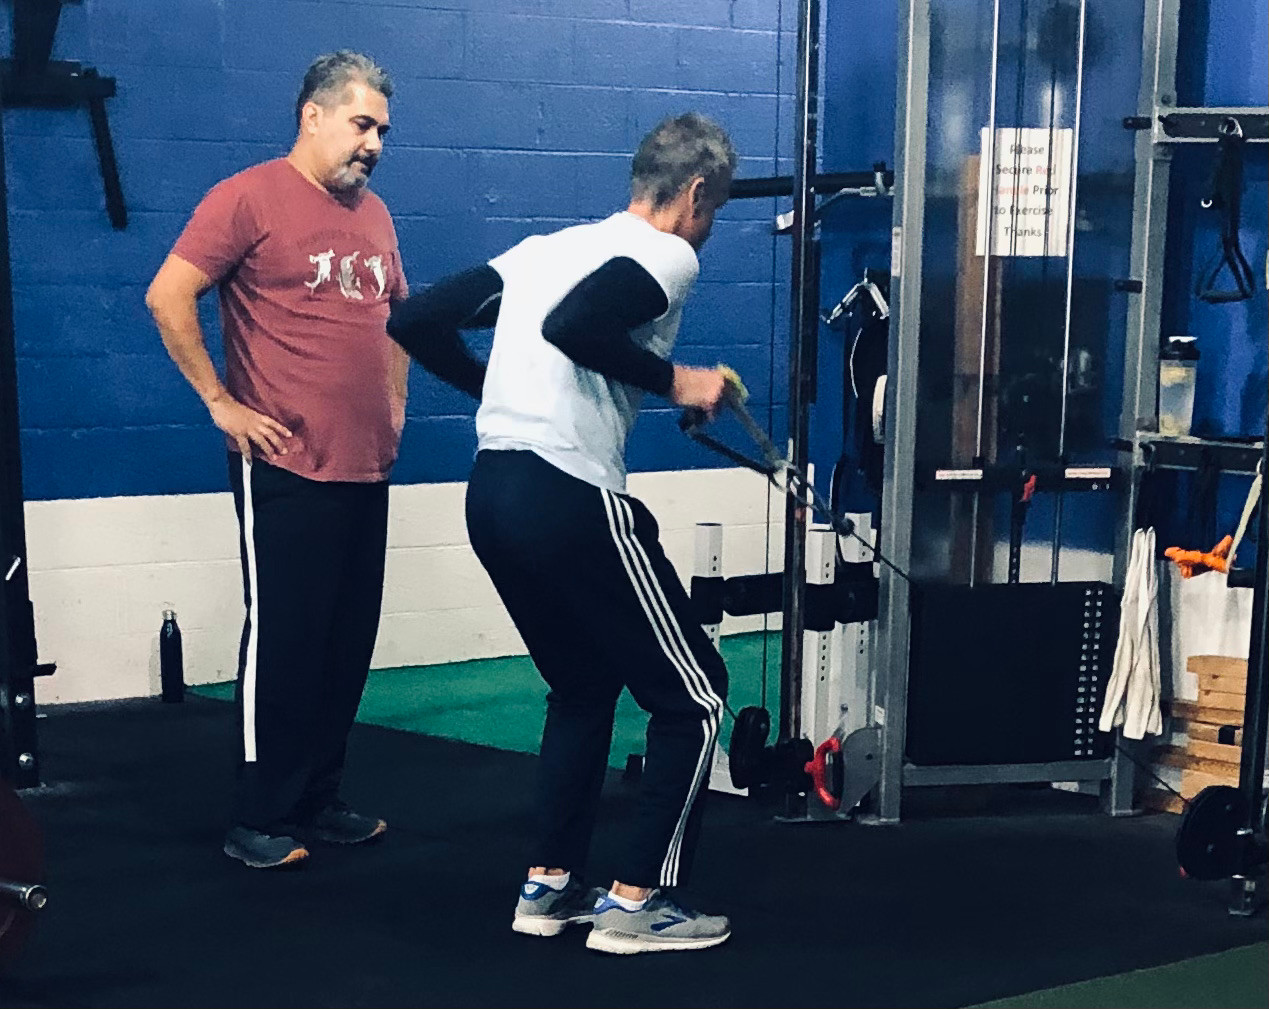 Our trainer Tom Lengyel